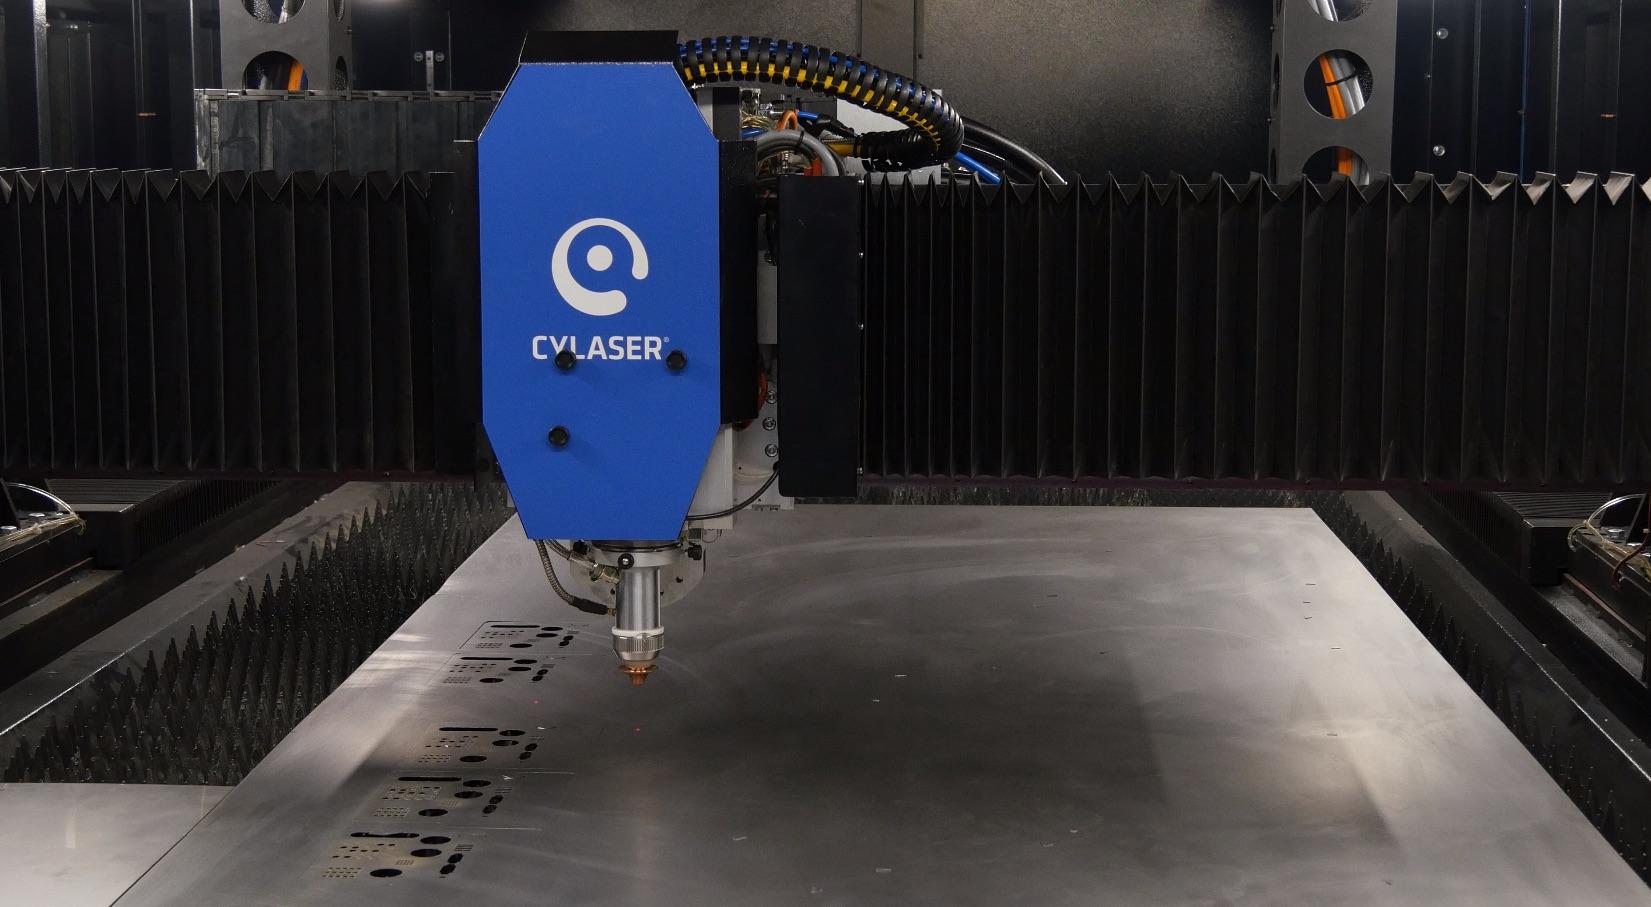 _sistema_taglio_laser_fibra_cy_laser_CY2D-LM3015